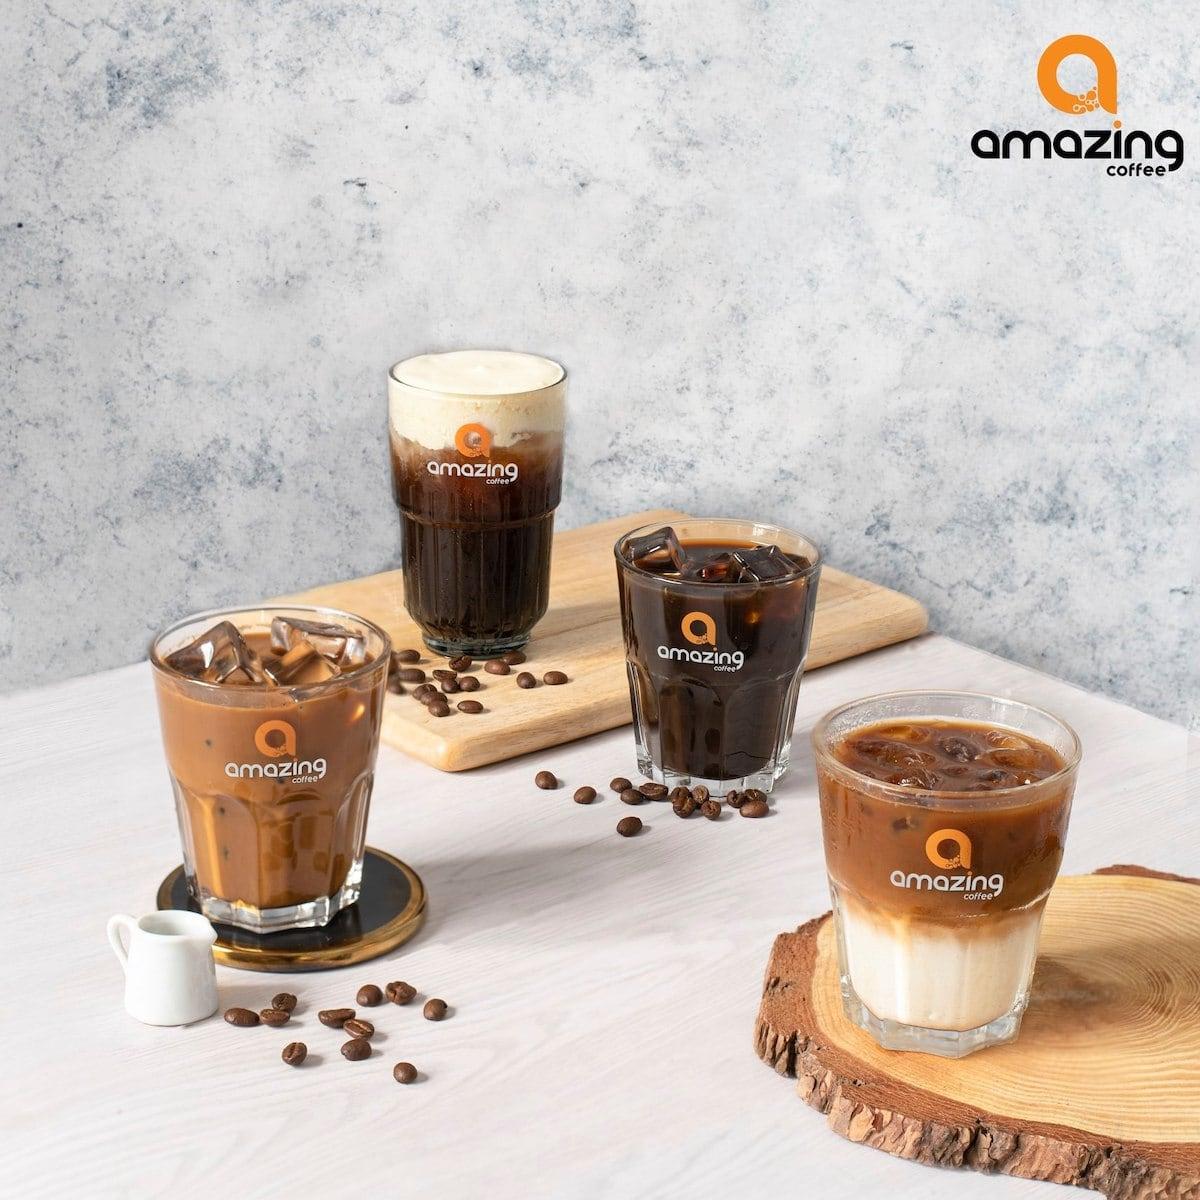 Iced coffee at Amazing Coffee